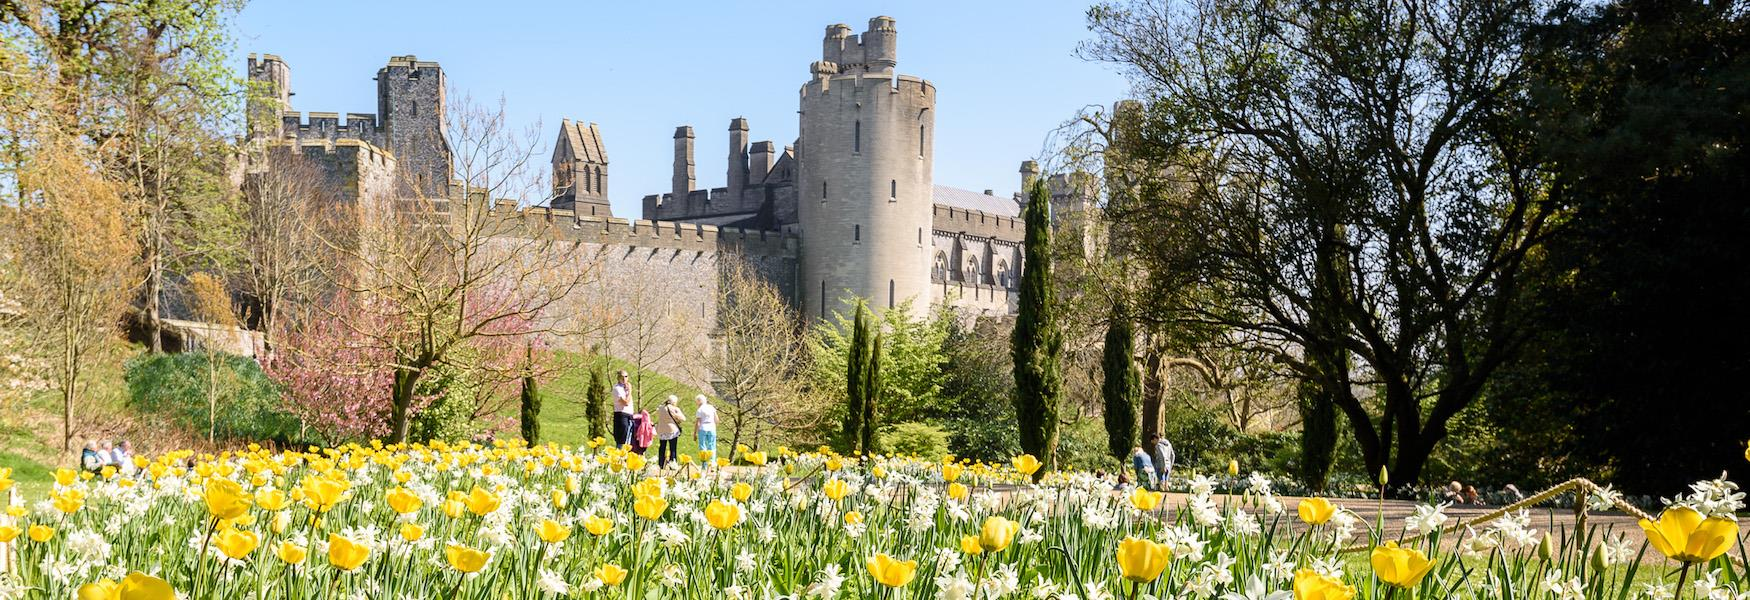 Arundel Castle Annual Tulip Festival